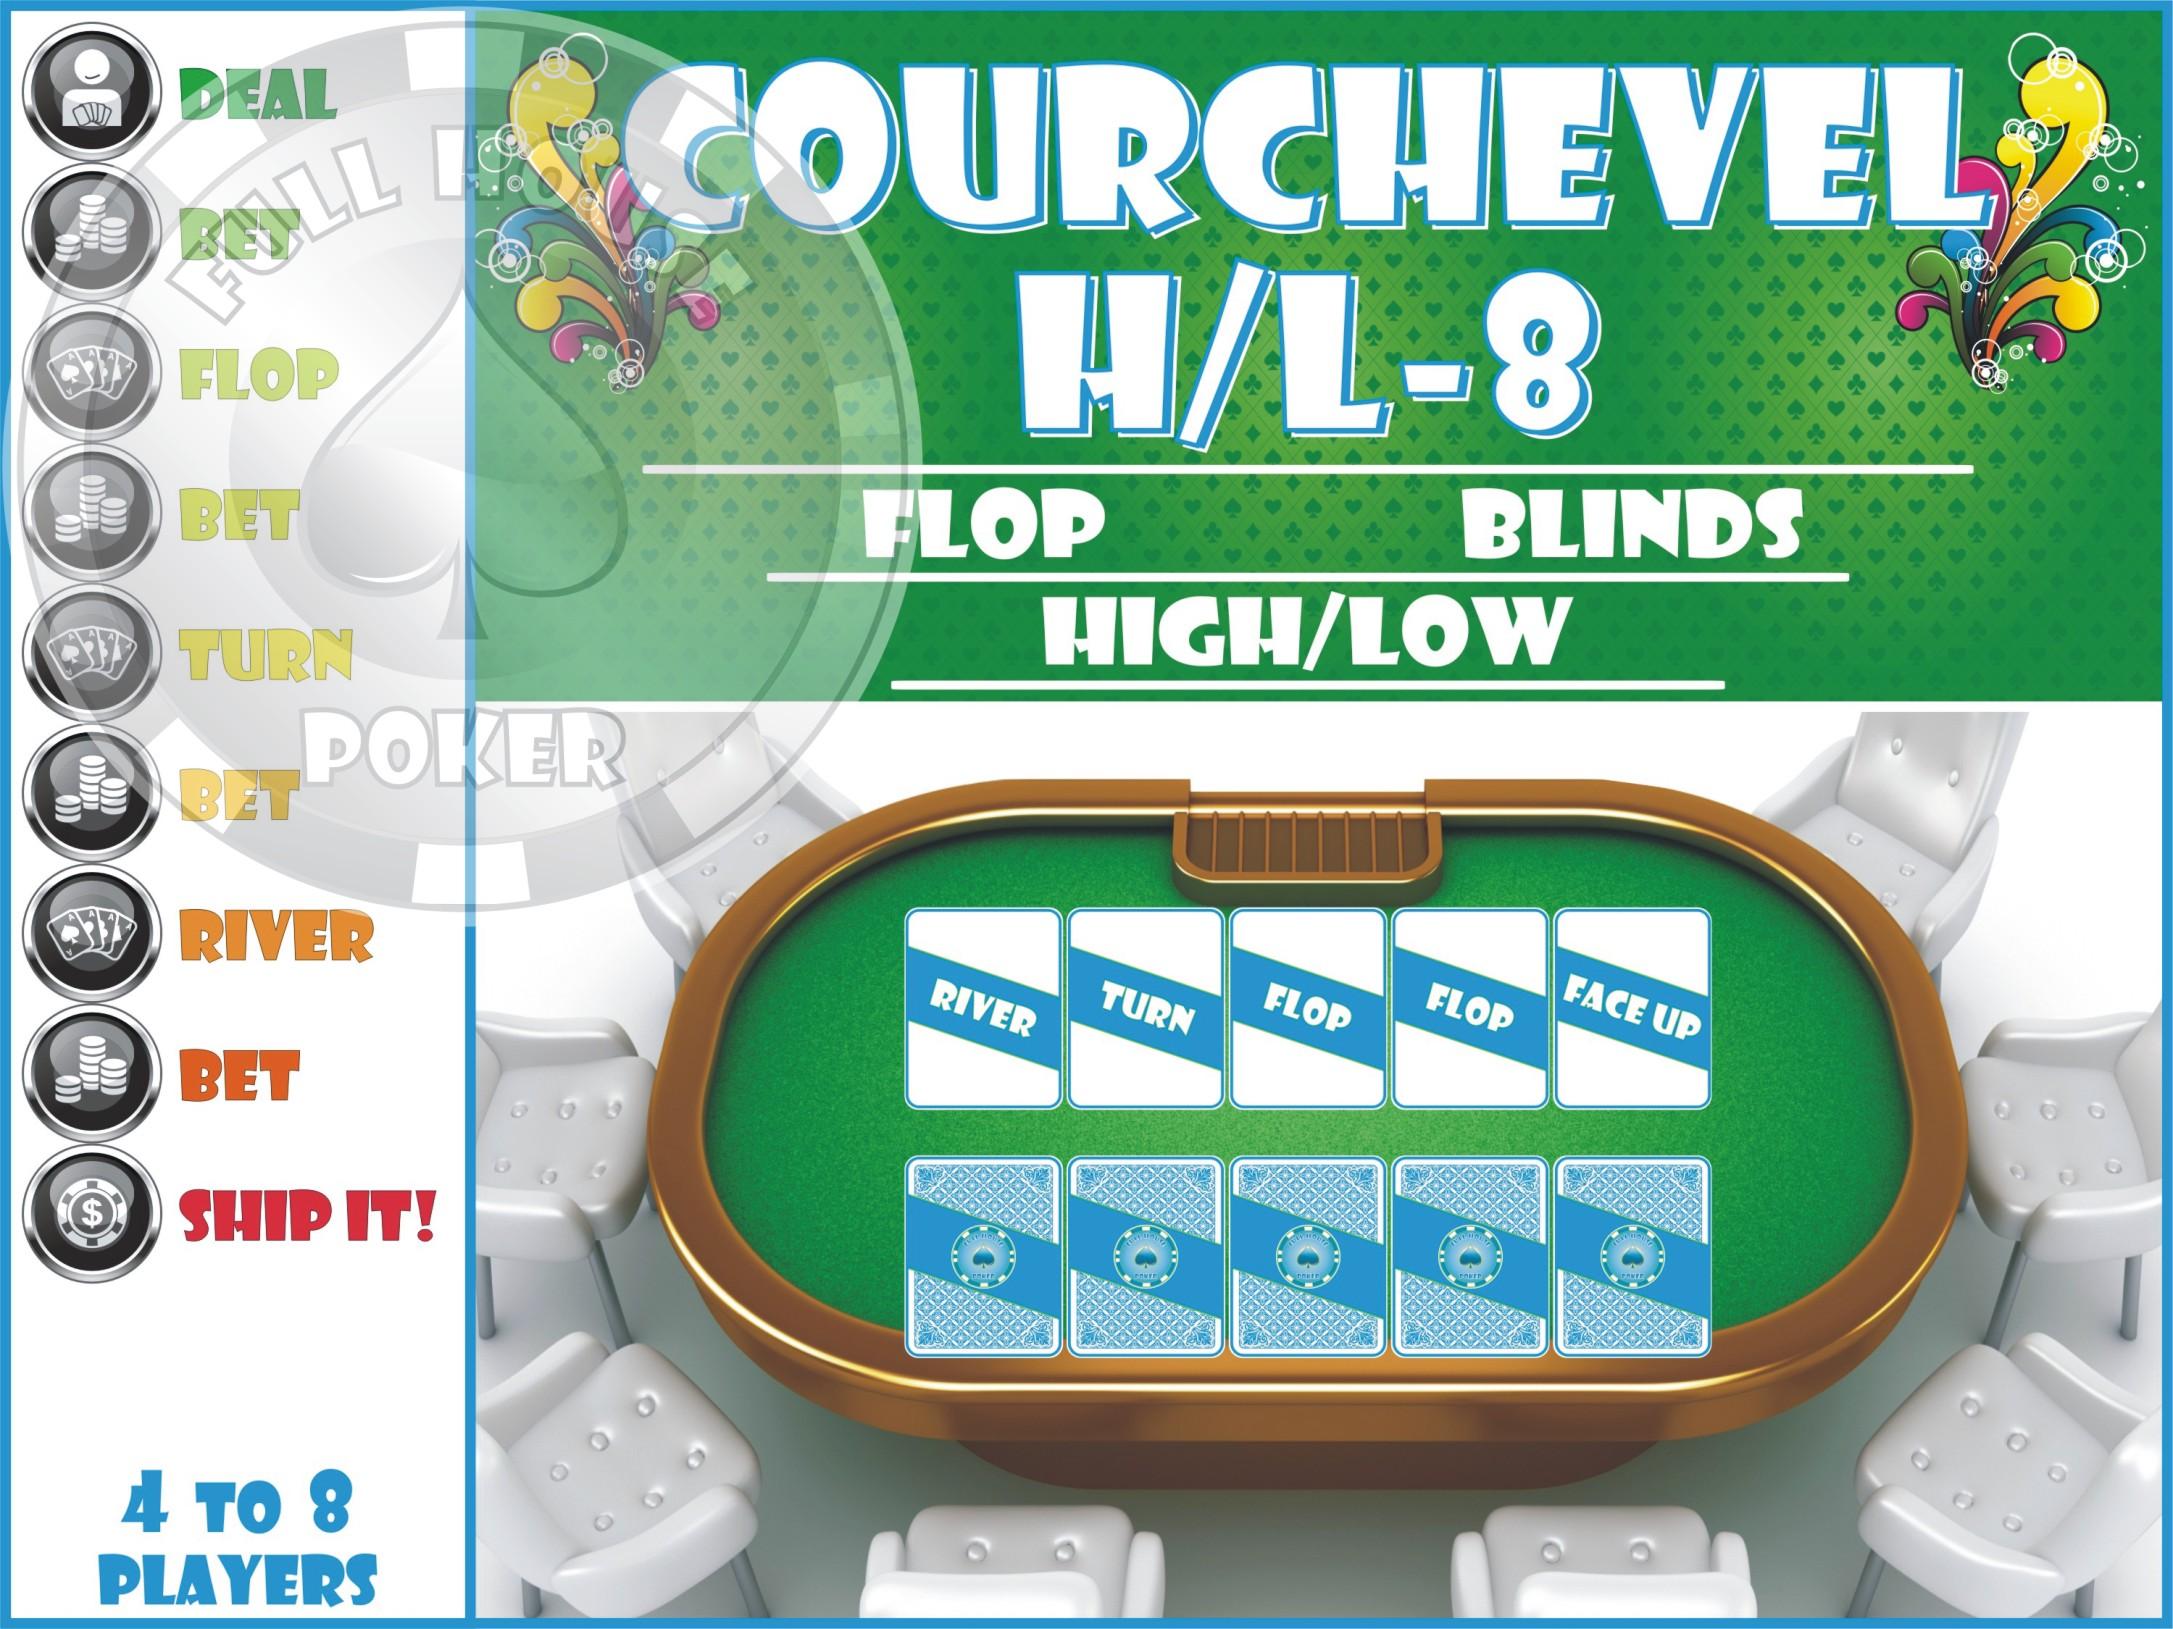 Courchevel H-L-8.JPG